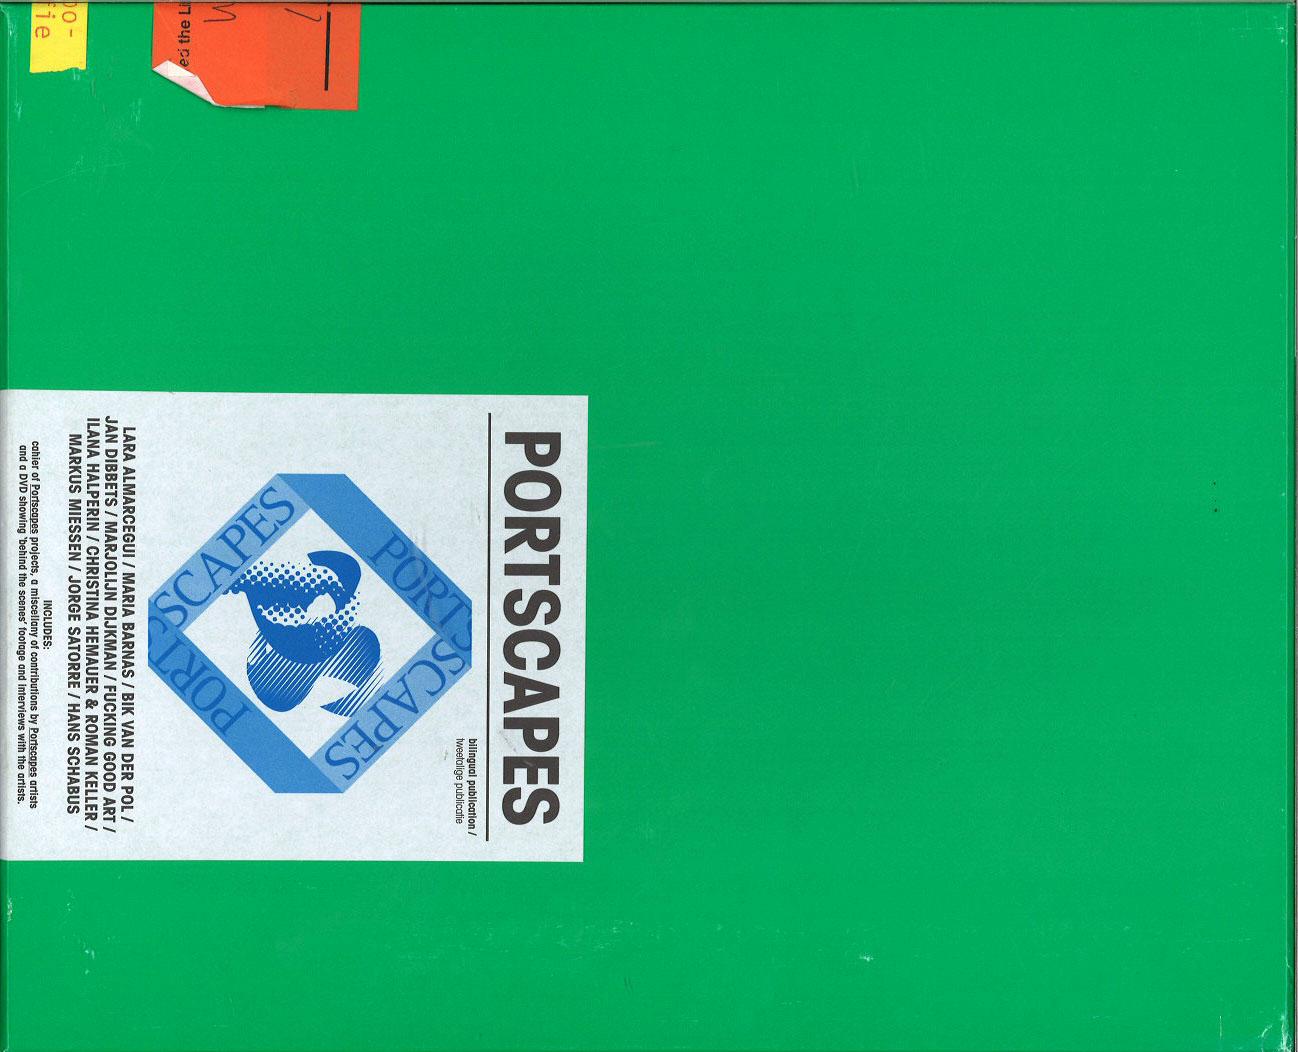 Postscapes